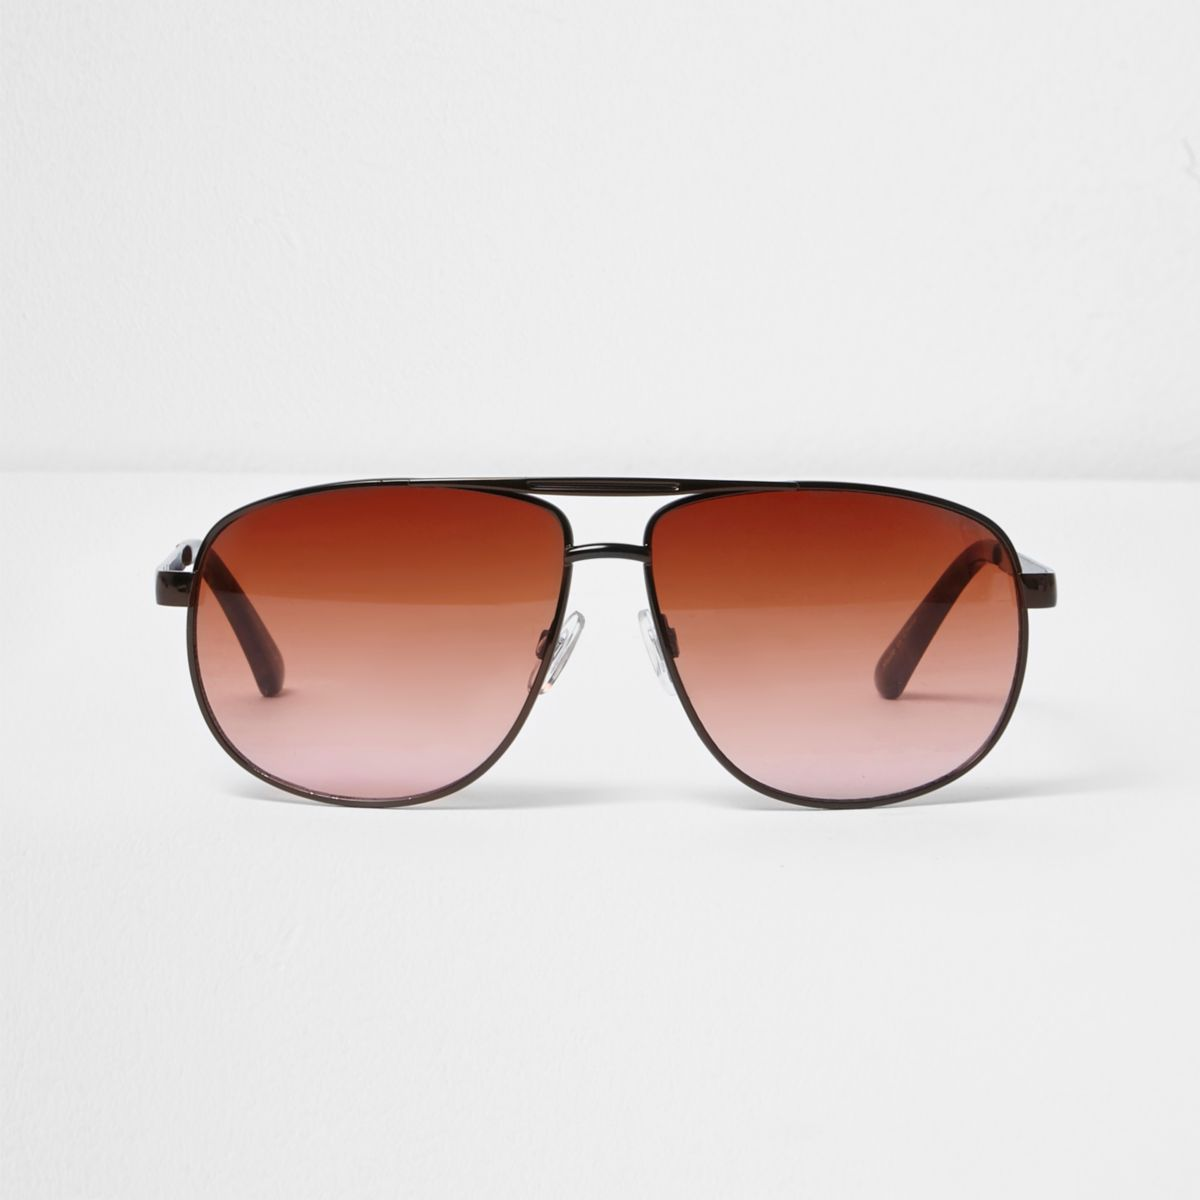 Brown orange lens aviator sunglasses